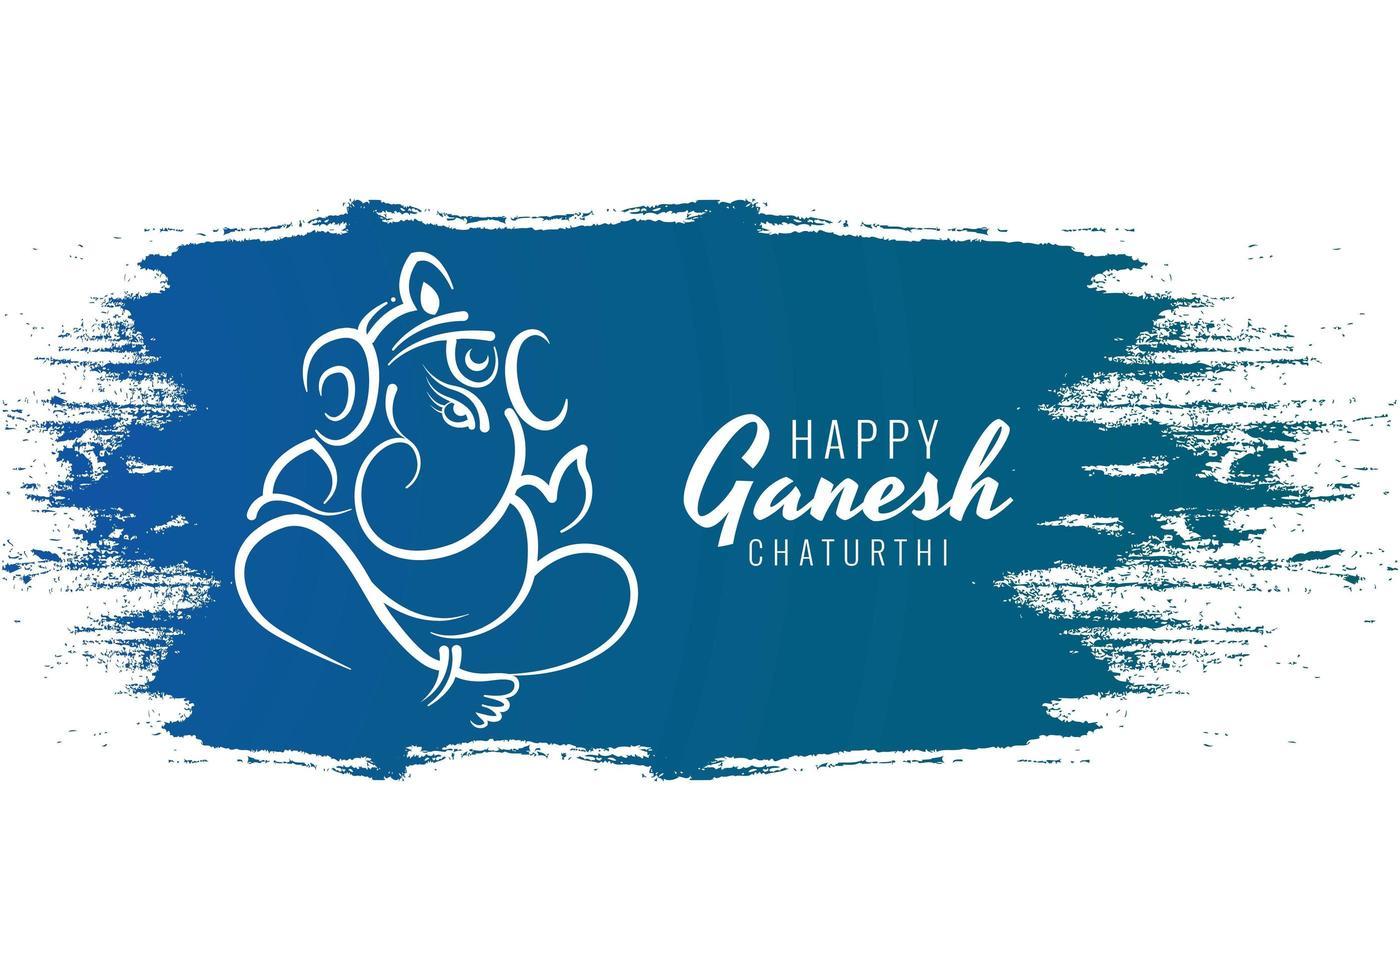 gelukkig ganesh chaturthi utsav-festival op blauwe verfstreken vector